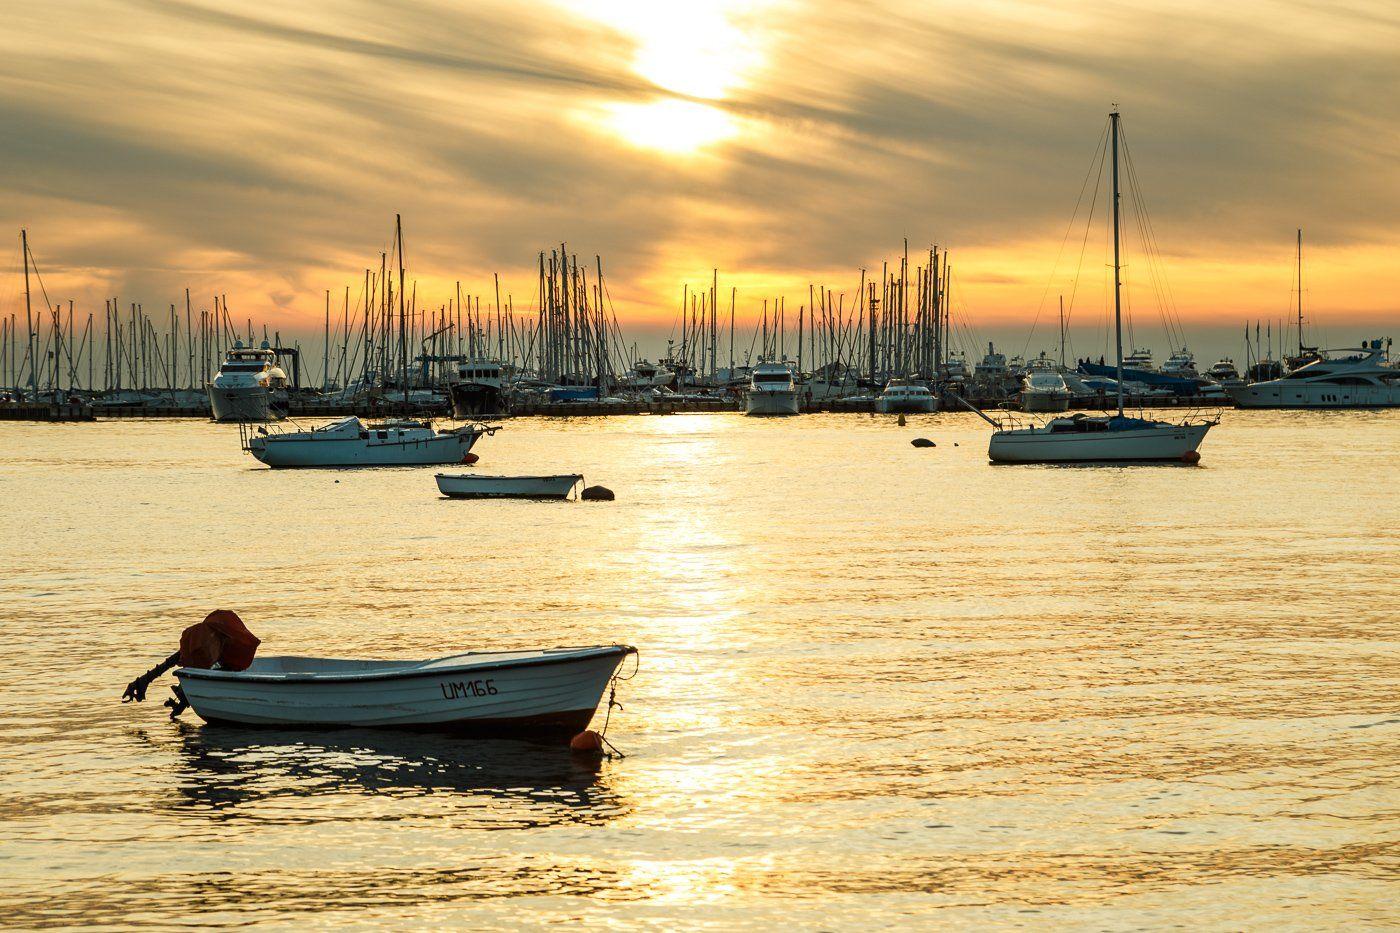 sea,umag,europe,boat,ship,landscape,water,sunset,sky,gold,sun, Алексей Гусев